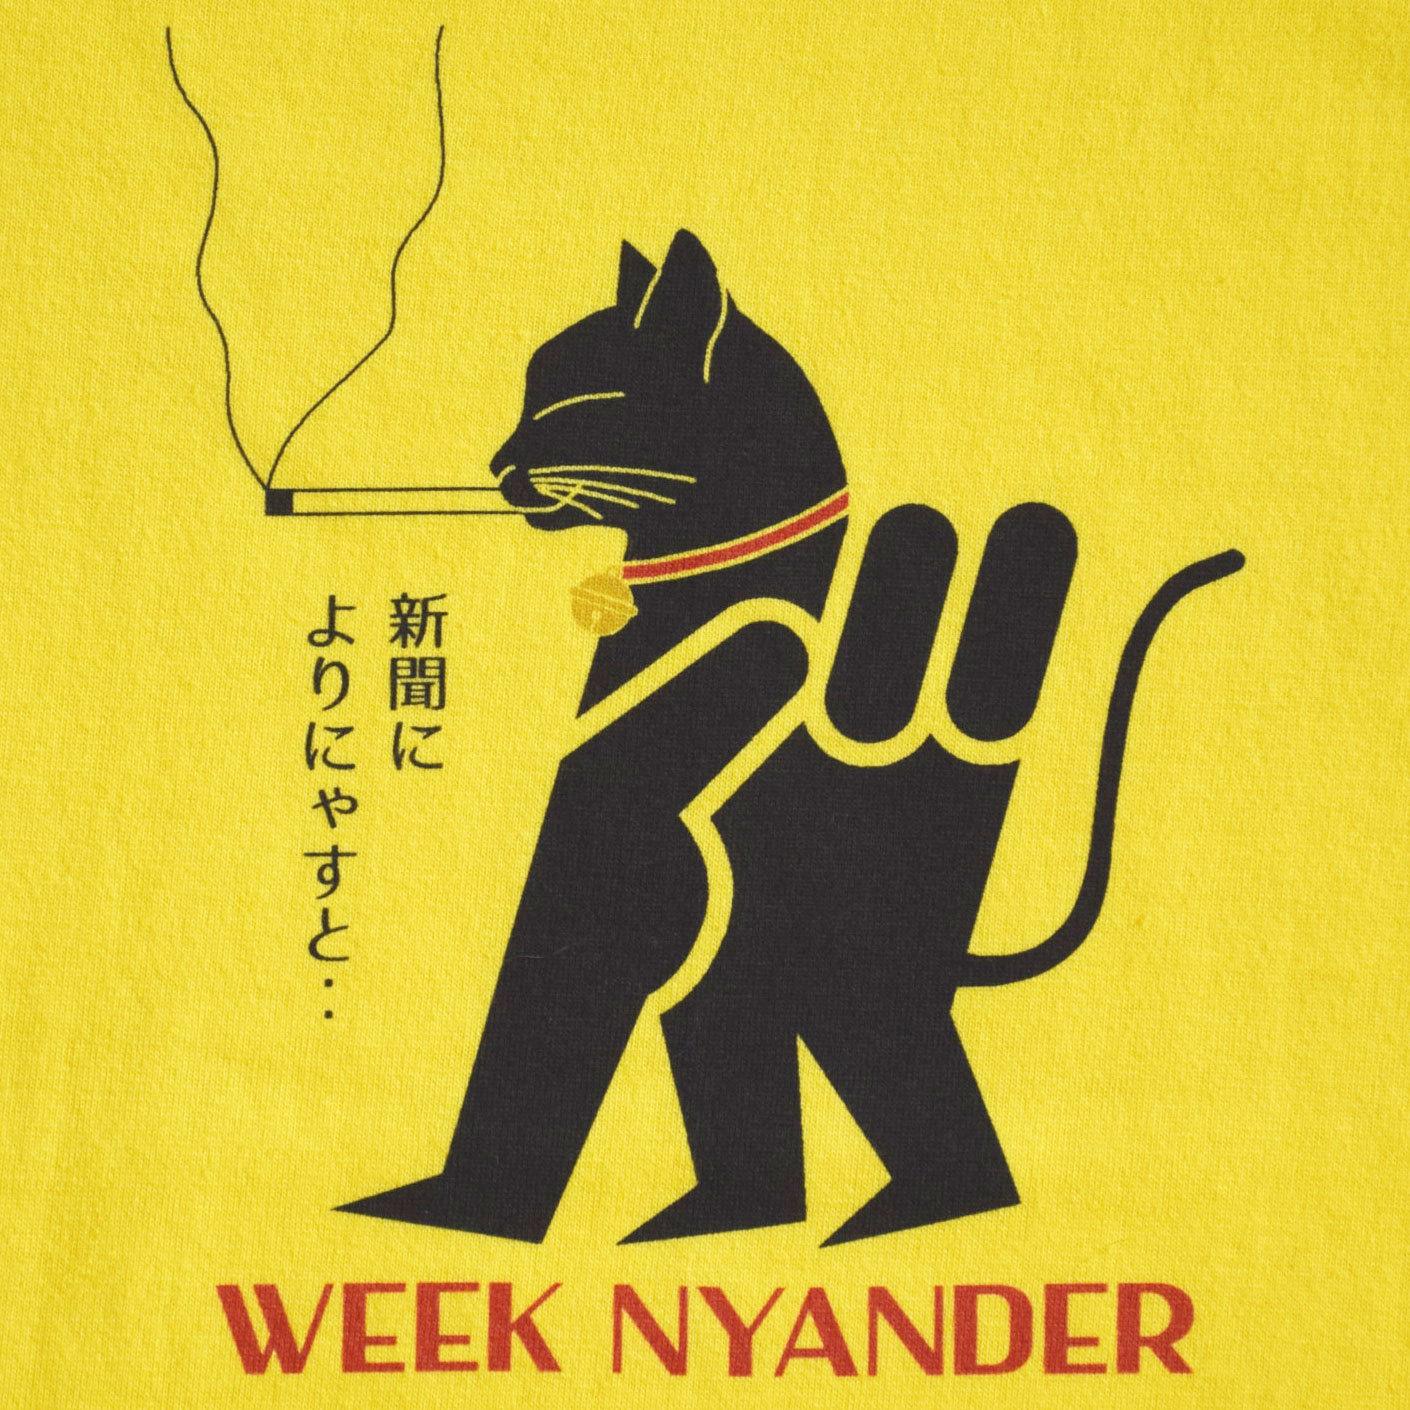 WEEK NYANDER Tシャツ - 【Lady's】